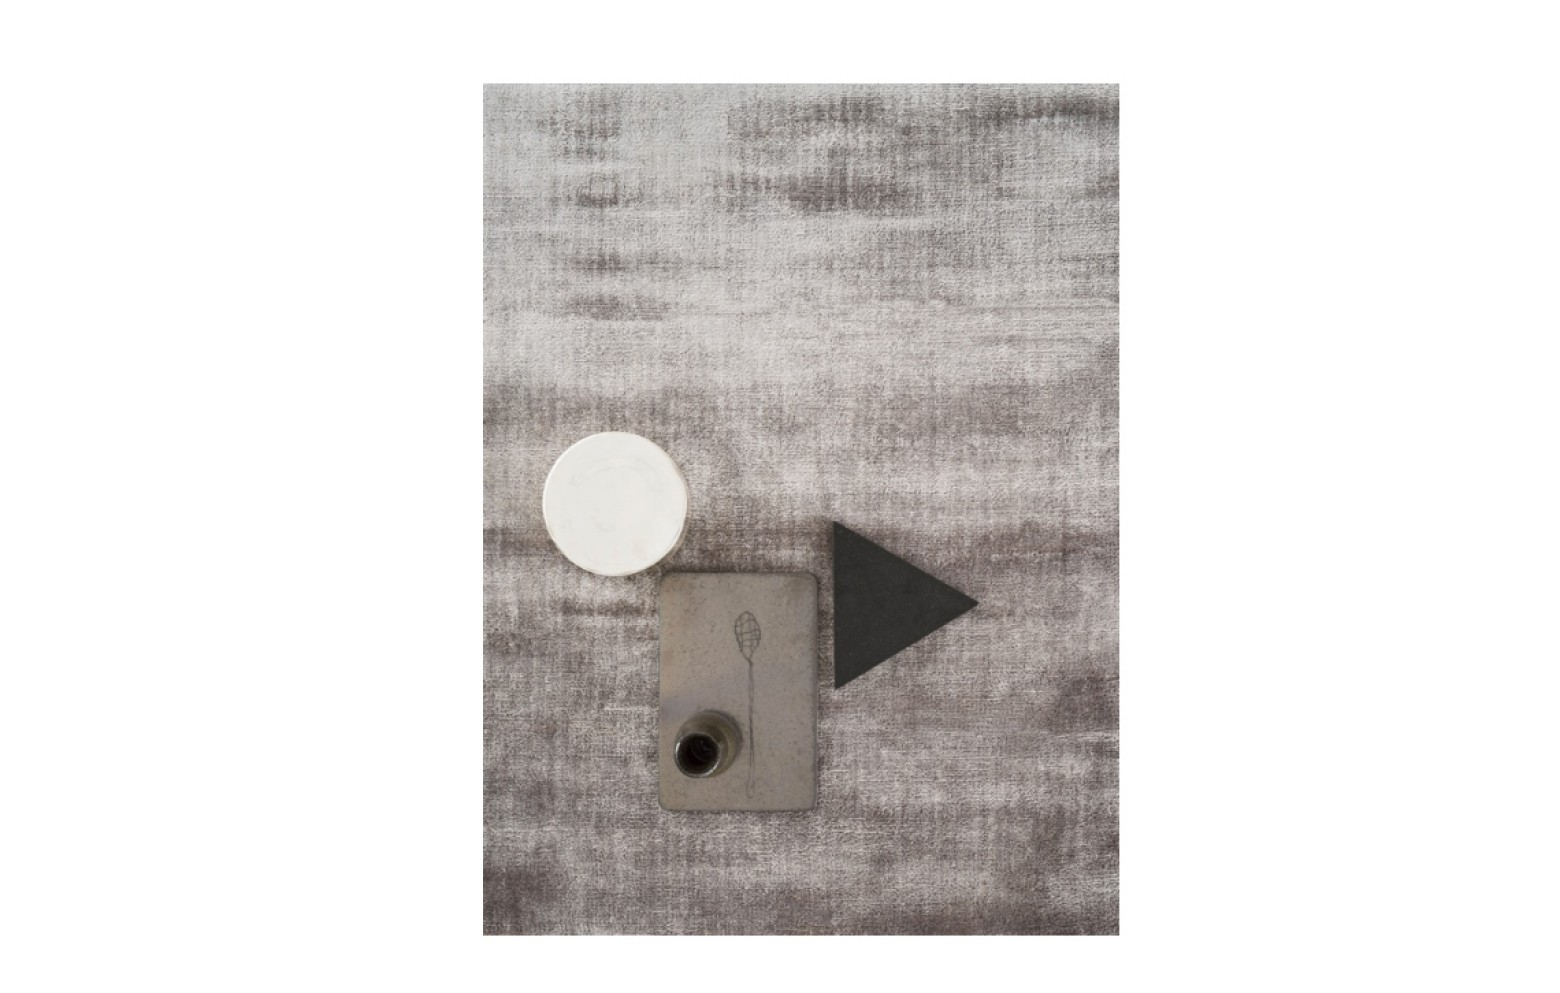 LUCENS  Teppiche  Kleinmöbel & Accessoires  Whos perfe